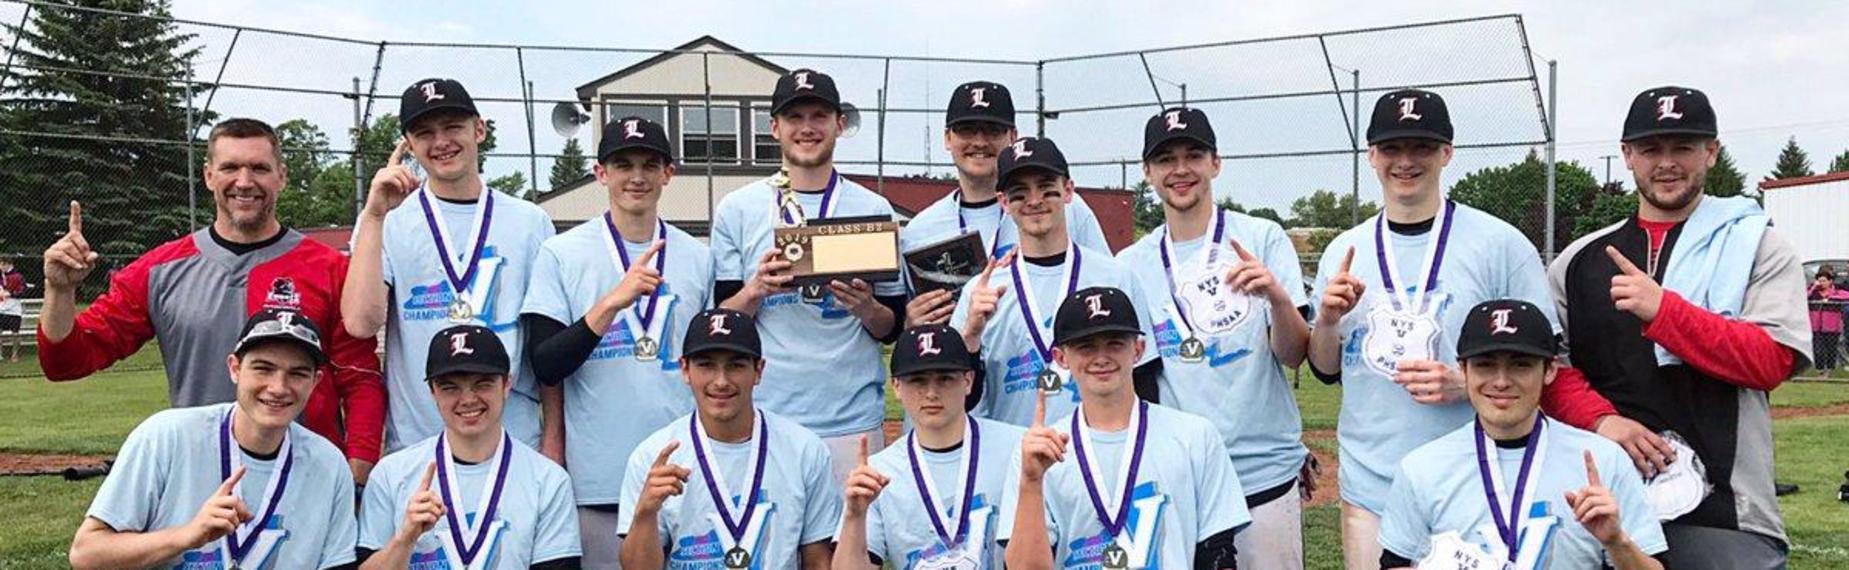 Boys Baseball Section V Champs